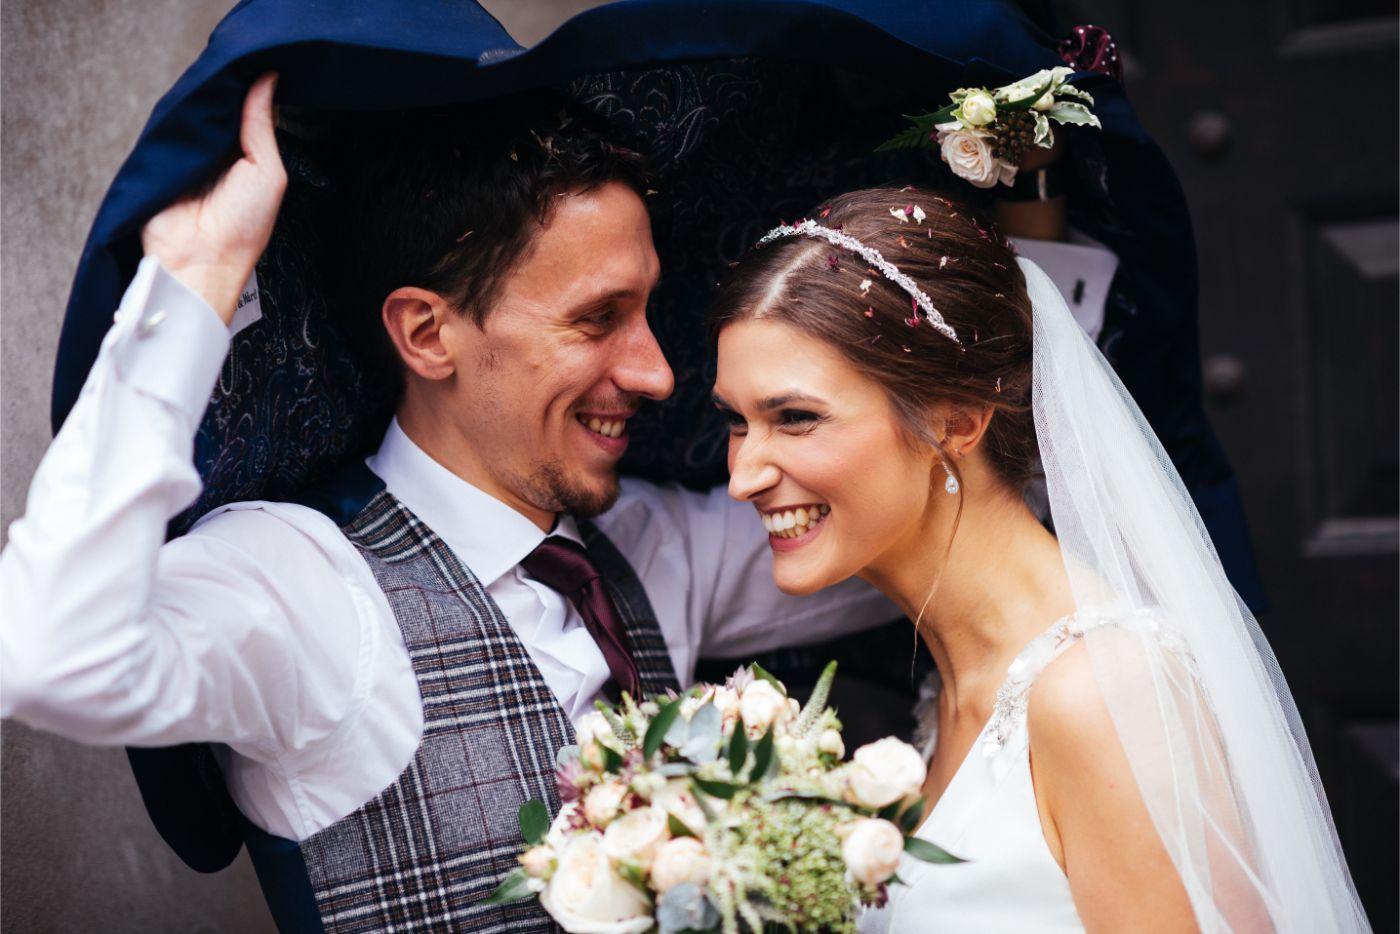 makeup, makeup artist, makeup artist manchester, manchester bride, manchester wedding, wedding at Midland Hotel, makeup artist the Midland Hotel, Manchester